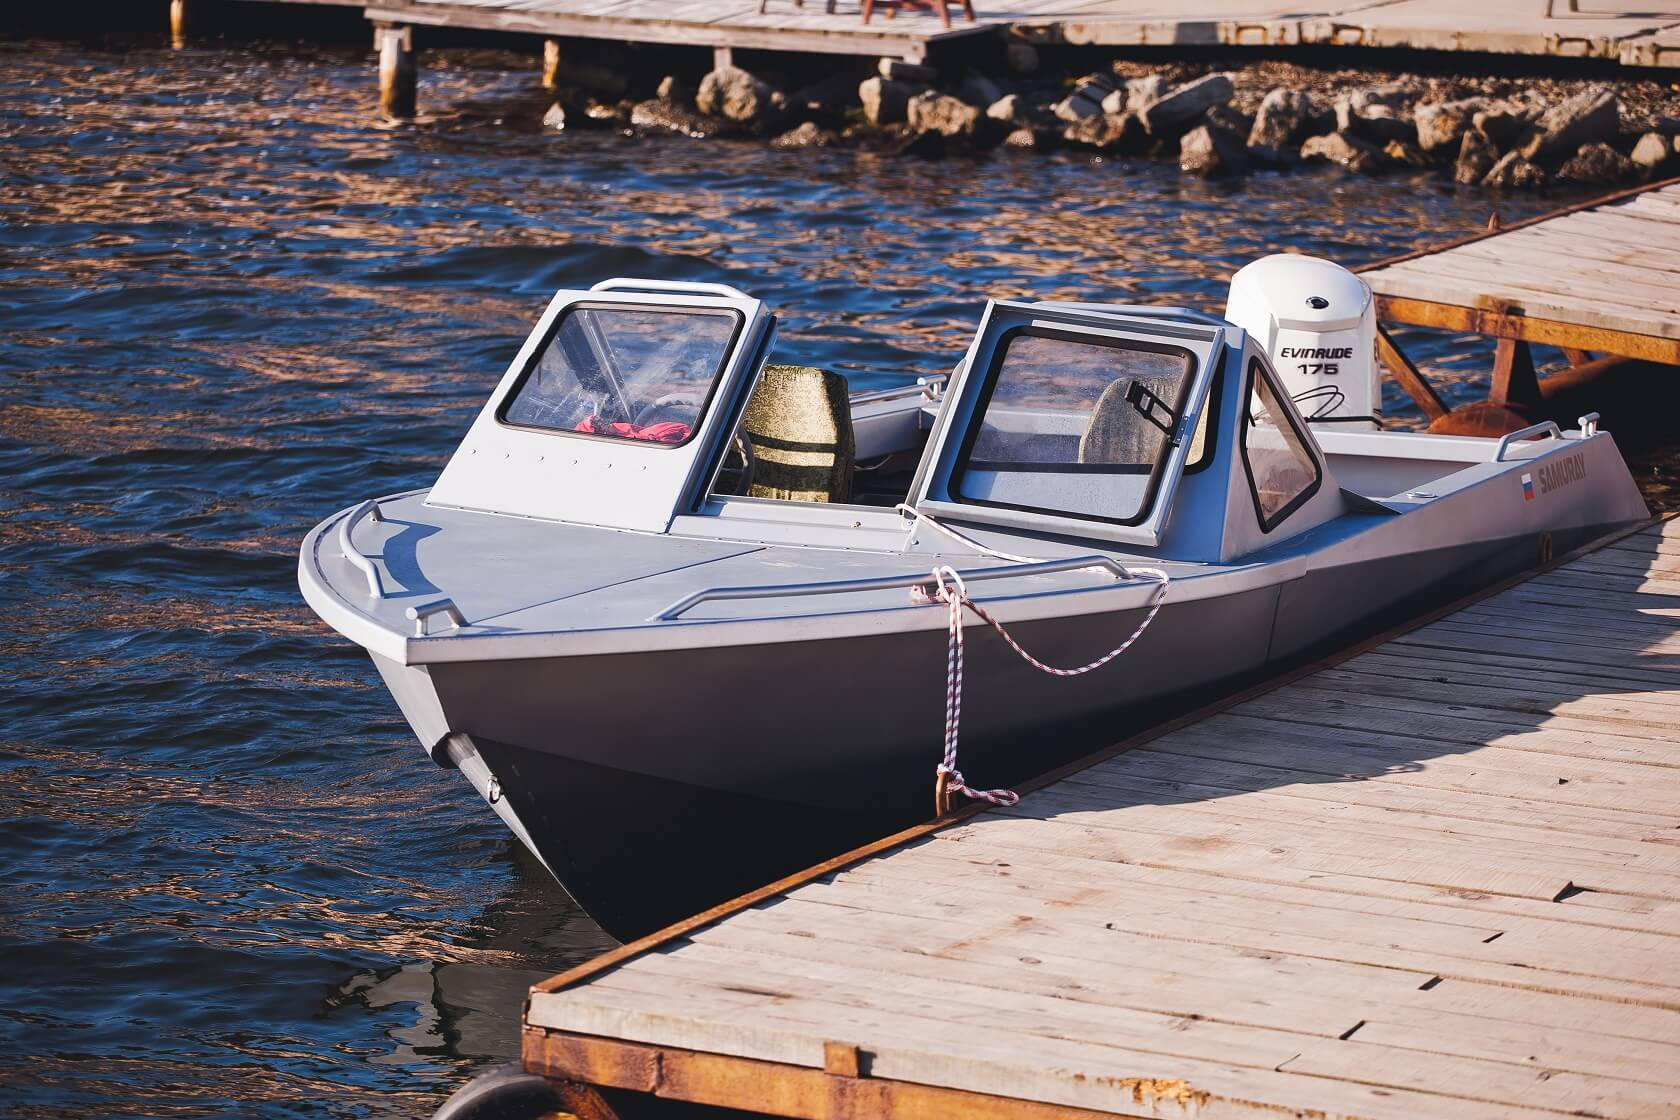 название моторных лодок с фото другие